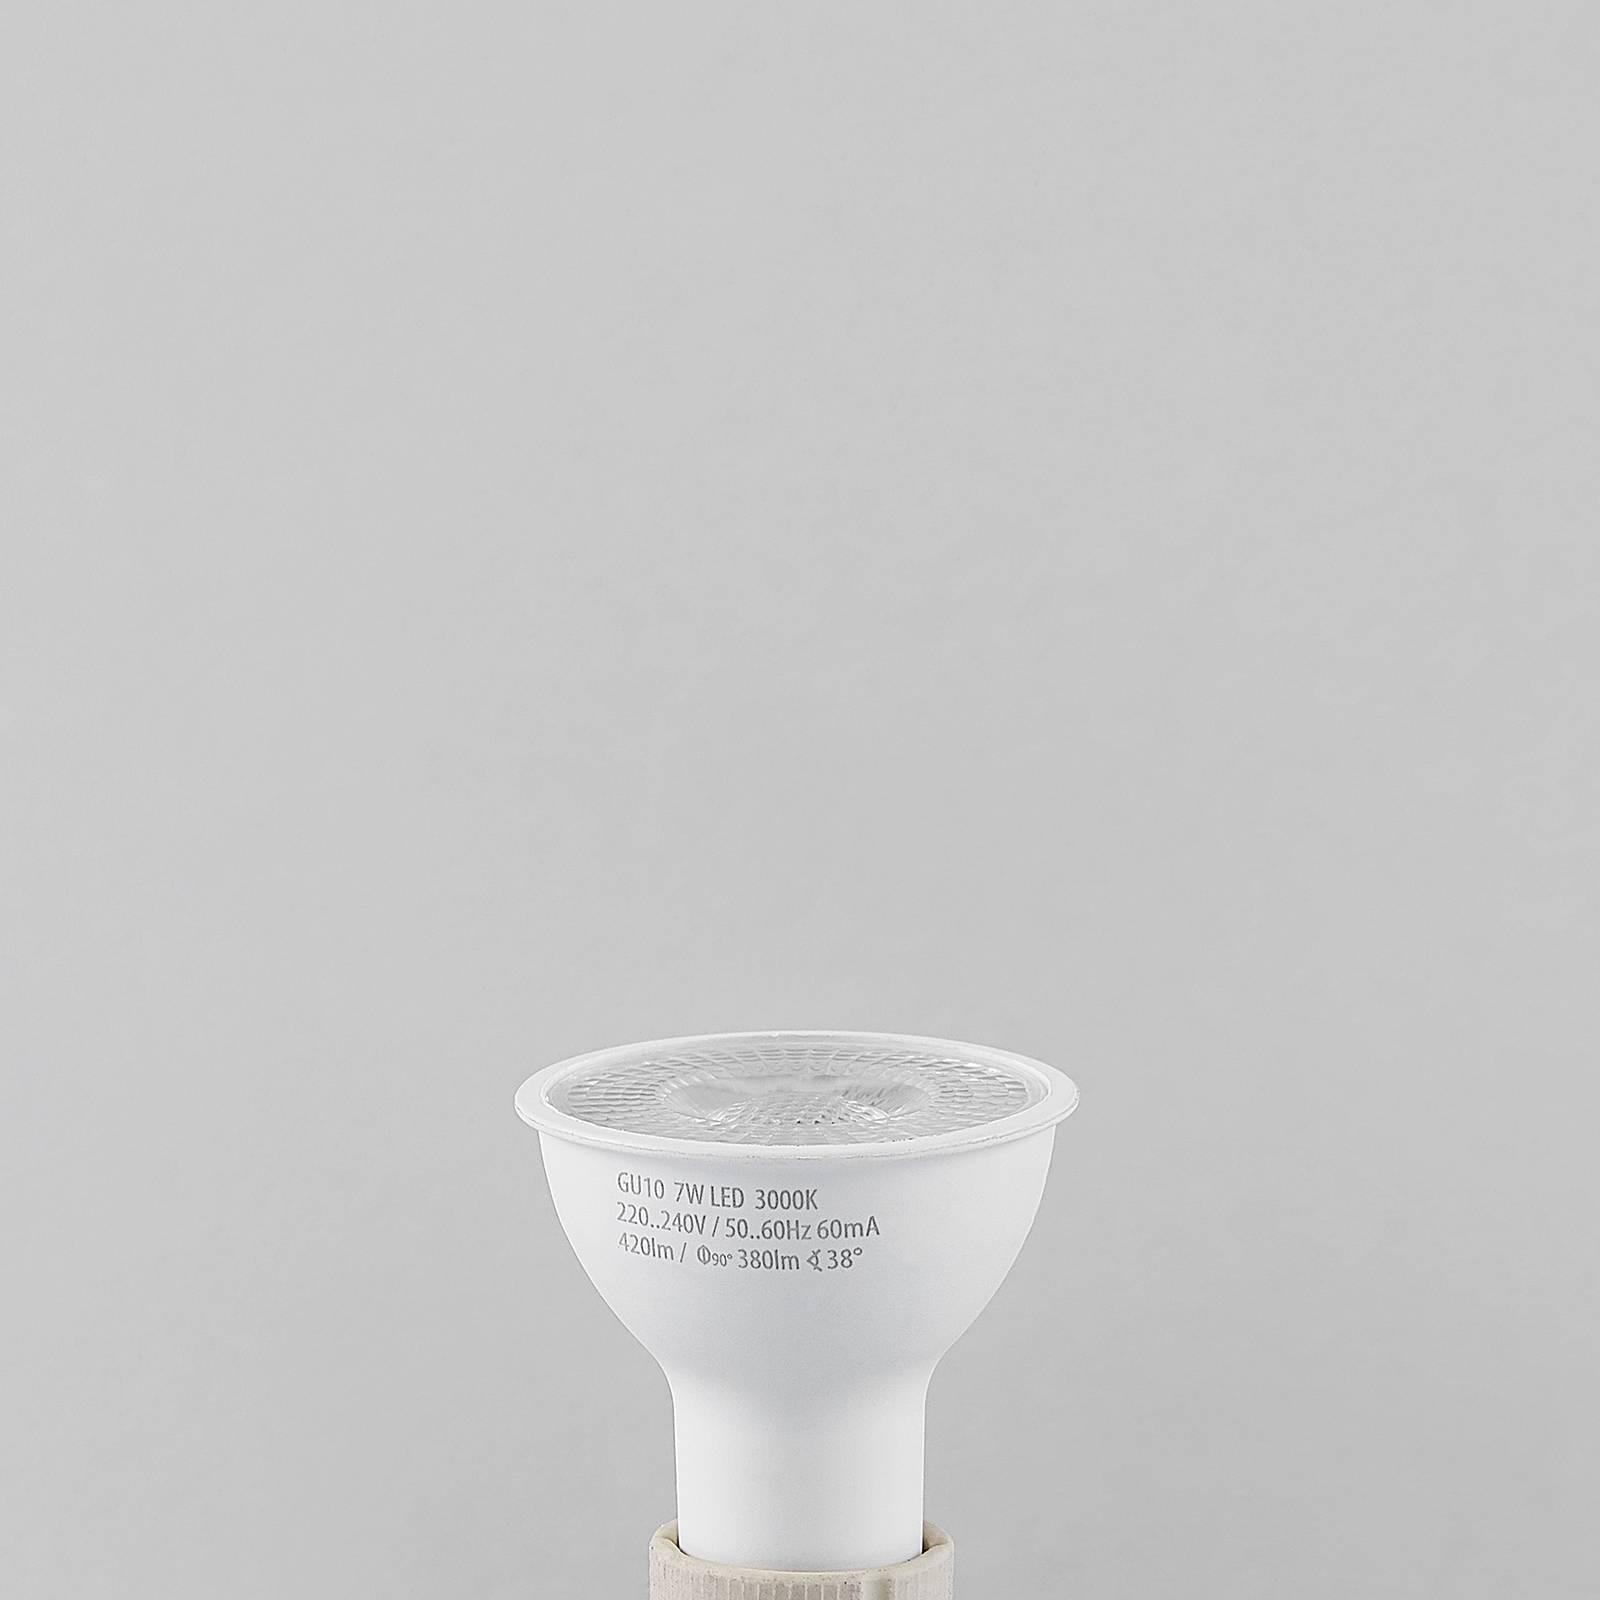 LED-heljastinlamppu GU10 7W 3 000 K, 420 lm, 38°